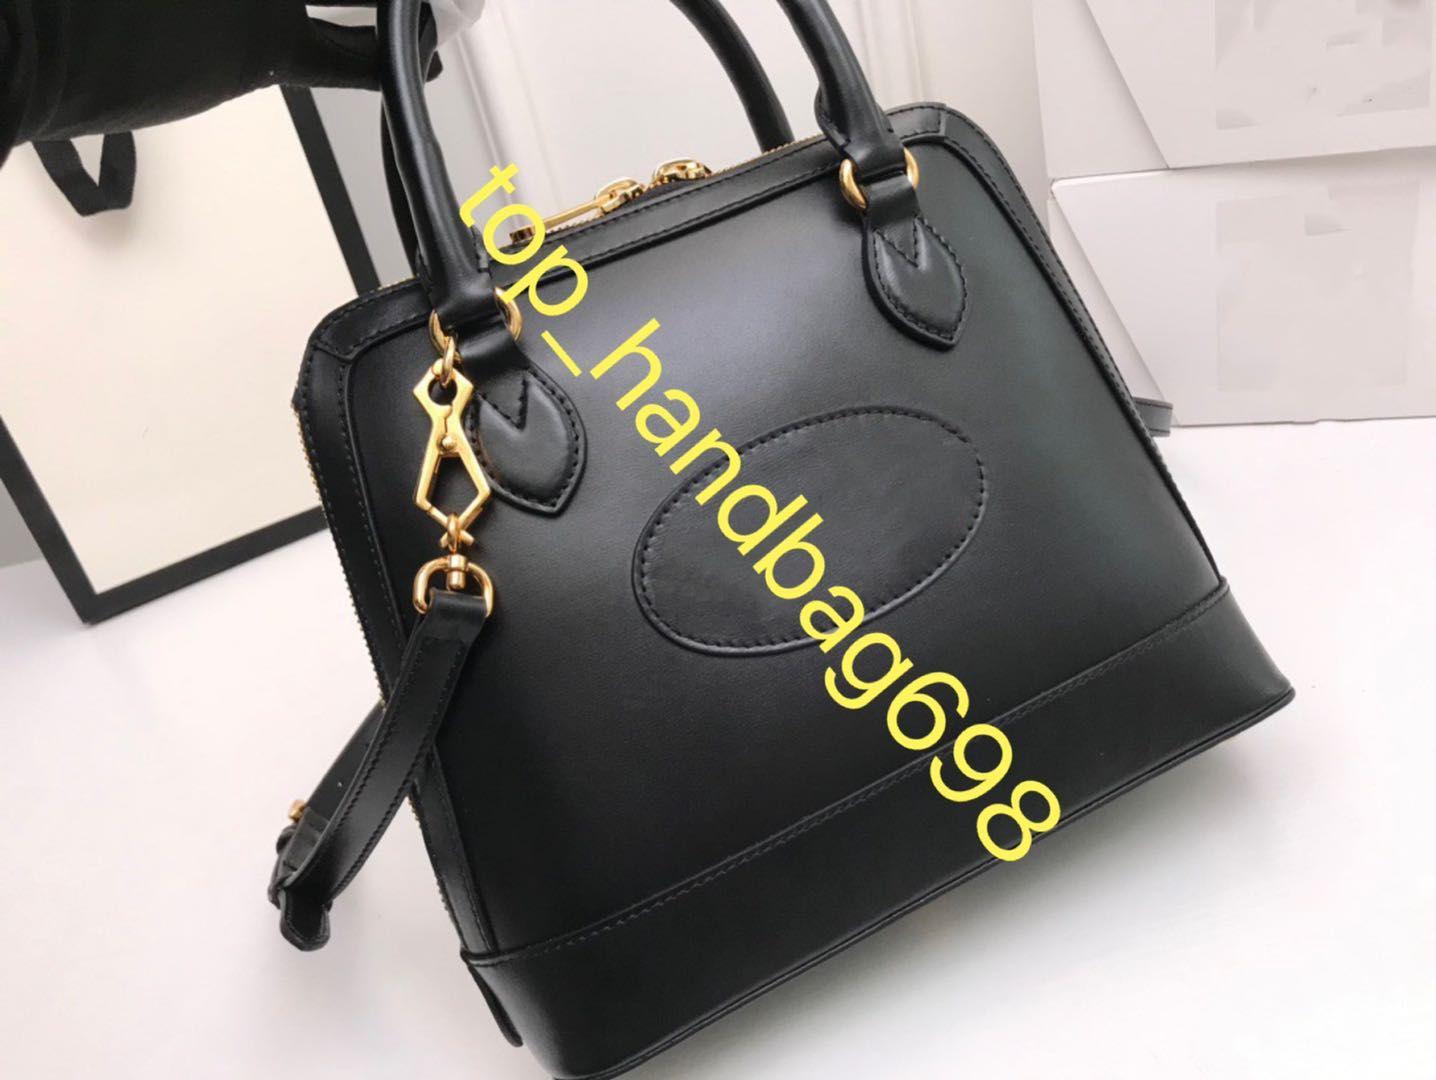 Sac messenger sac à main dame sacs crossbody coutures lettre cuir véritable sacs à main de sac de mode sac à main shell sac de haute qualité